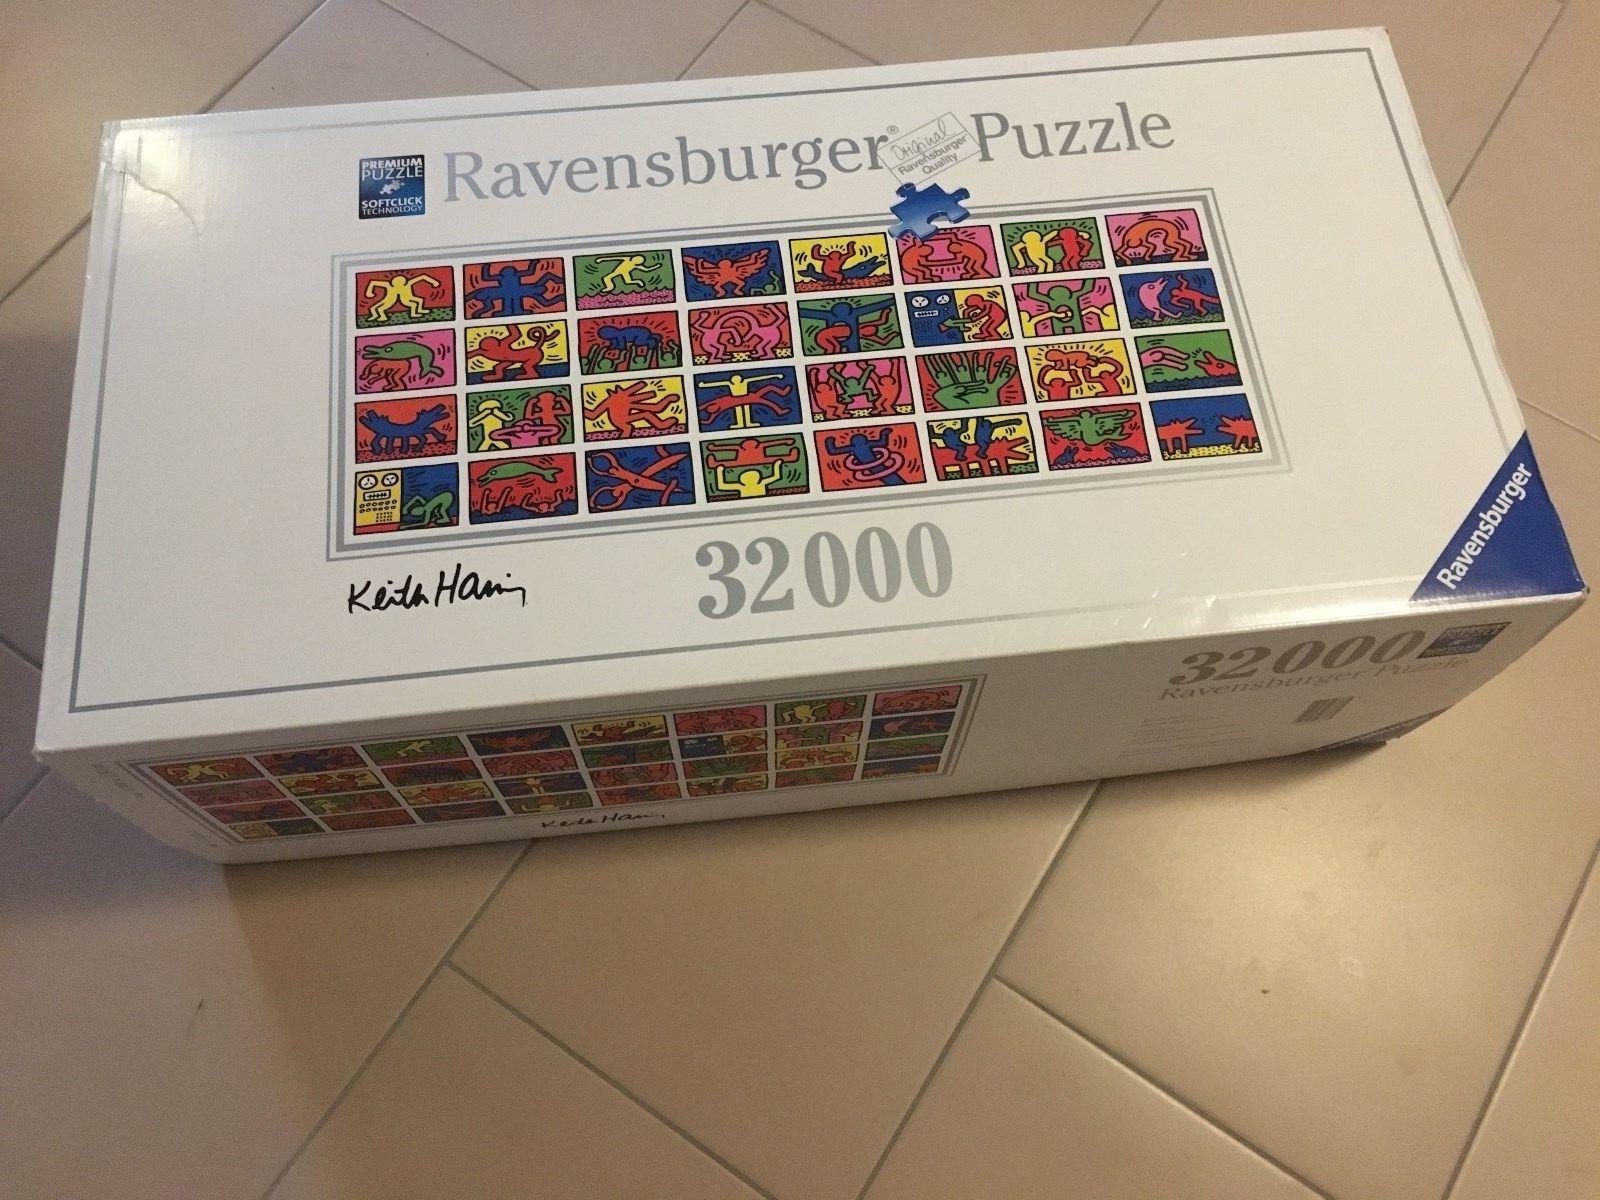 Ravensburger Puzzle 32000 Teile, Keith Haring, Rarität, Neuwertig